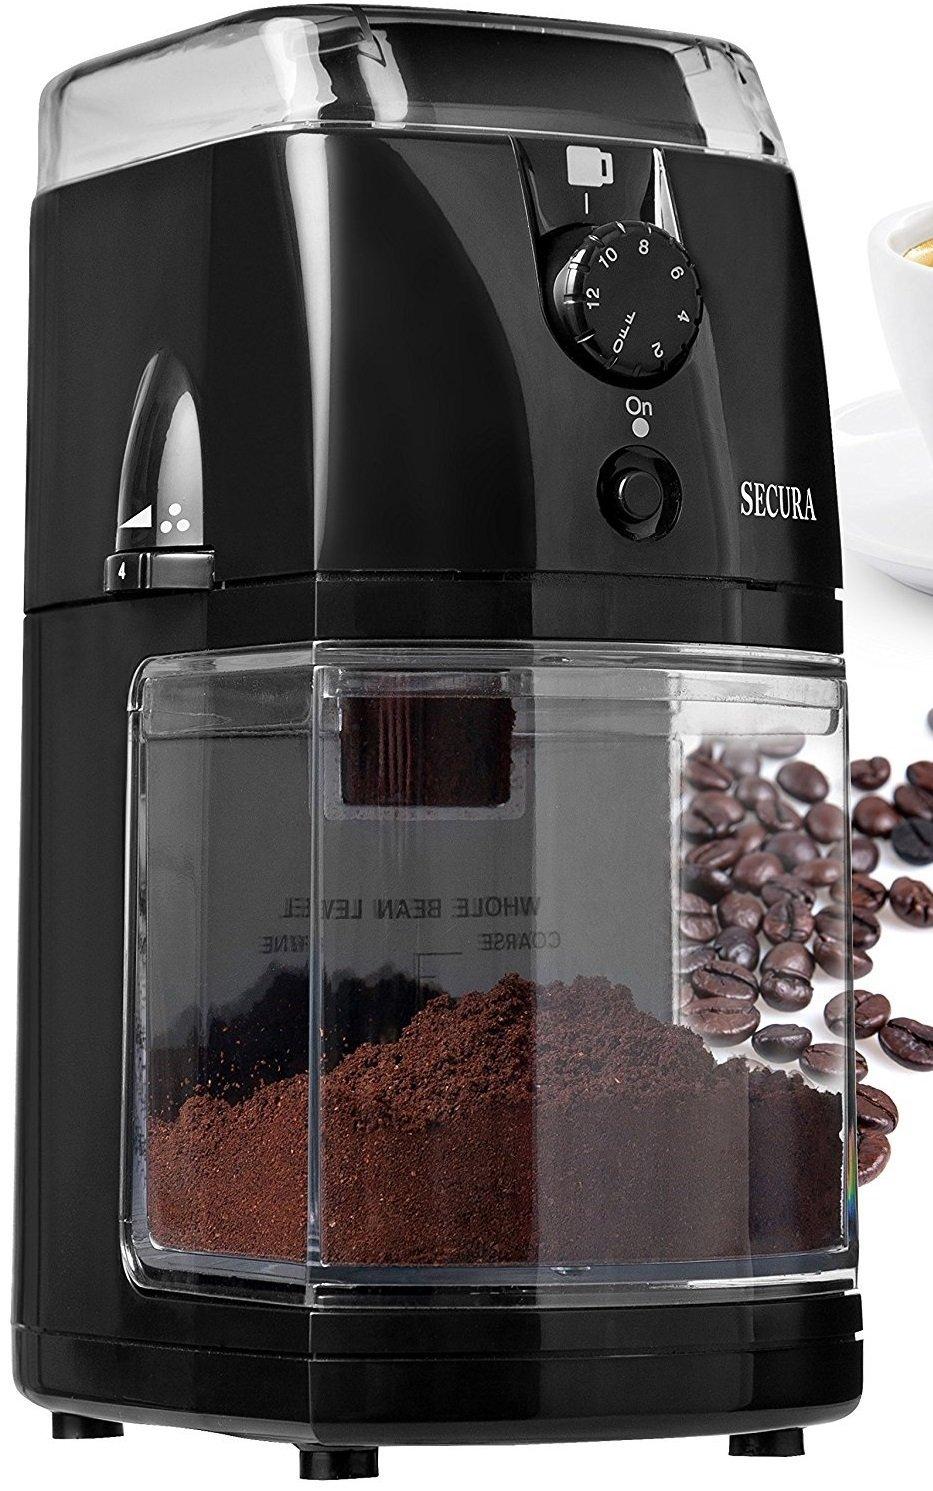 Automatic Coffee Grinder Amazon